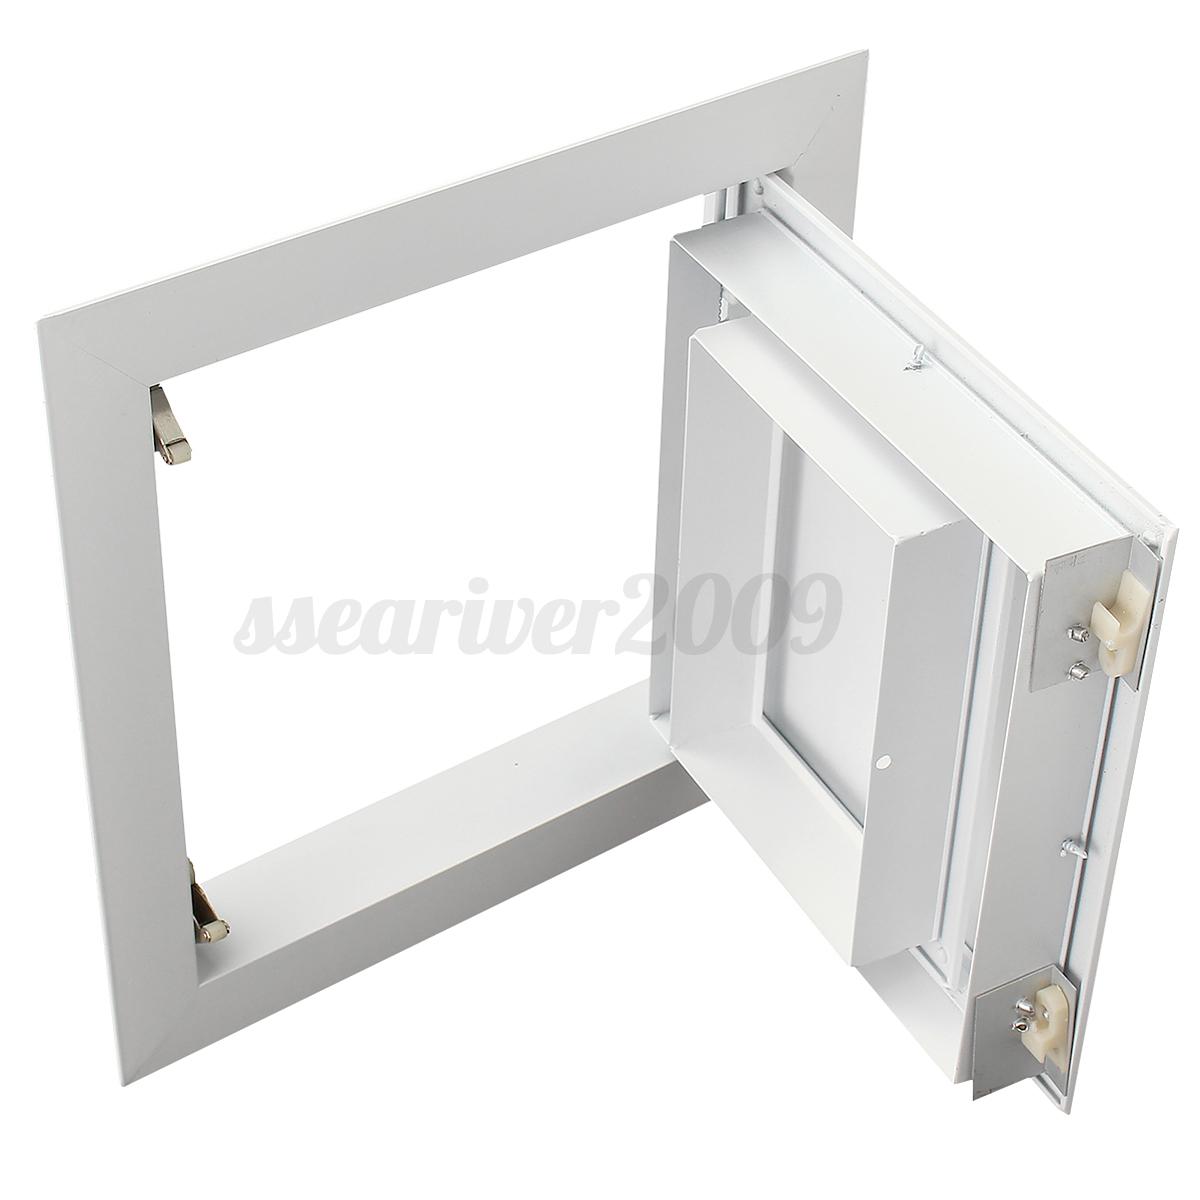 Aluminum Access Doors : Aluminum alloy access panel inspection revision door